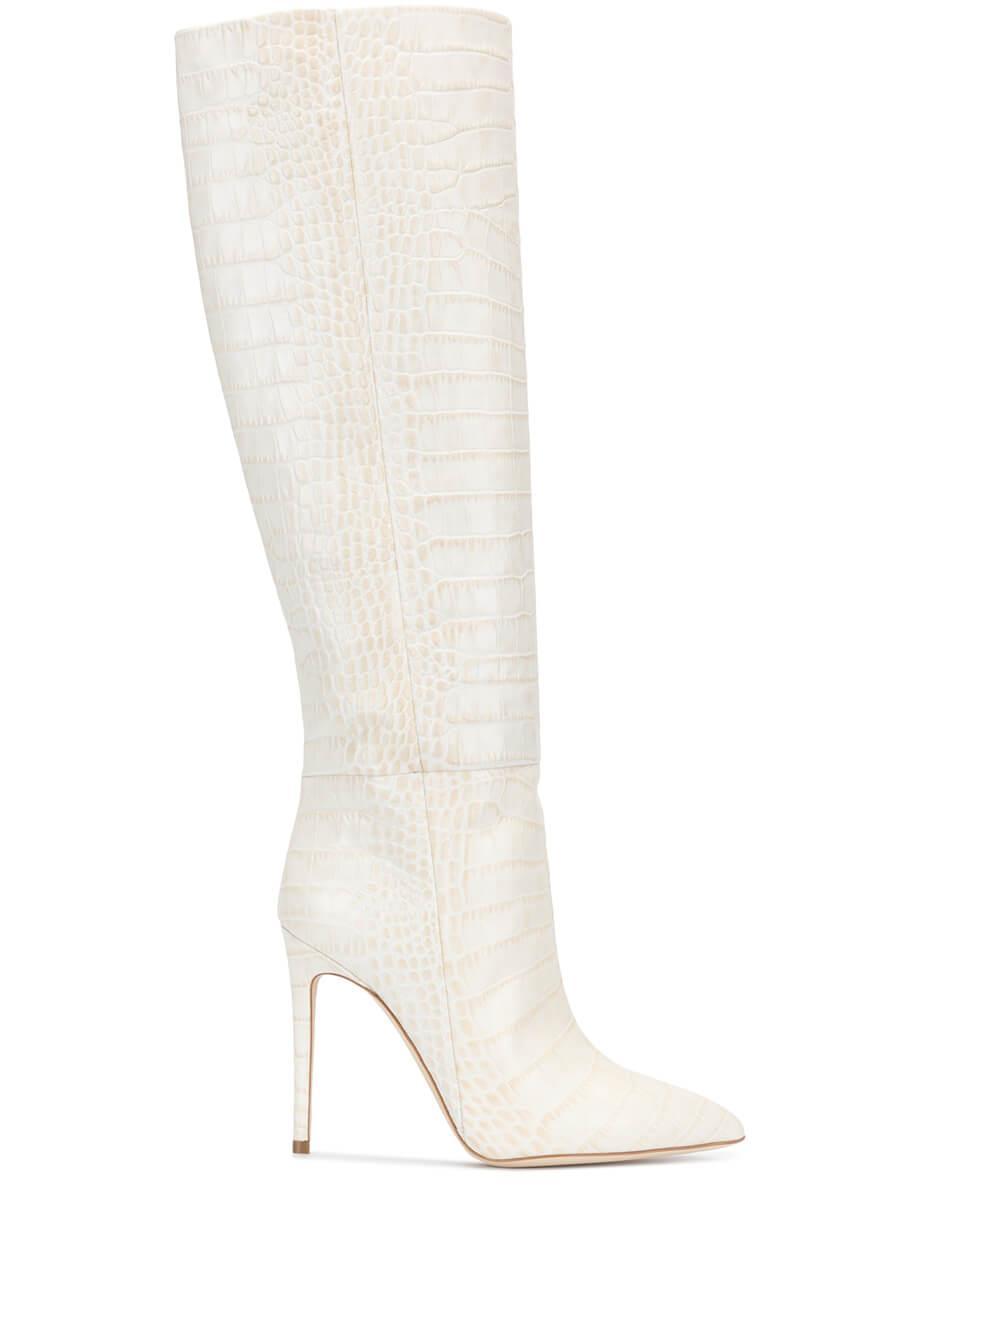 High Heel Croc Boot Item # PX133-XCSG2